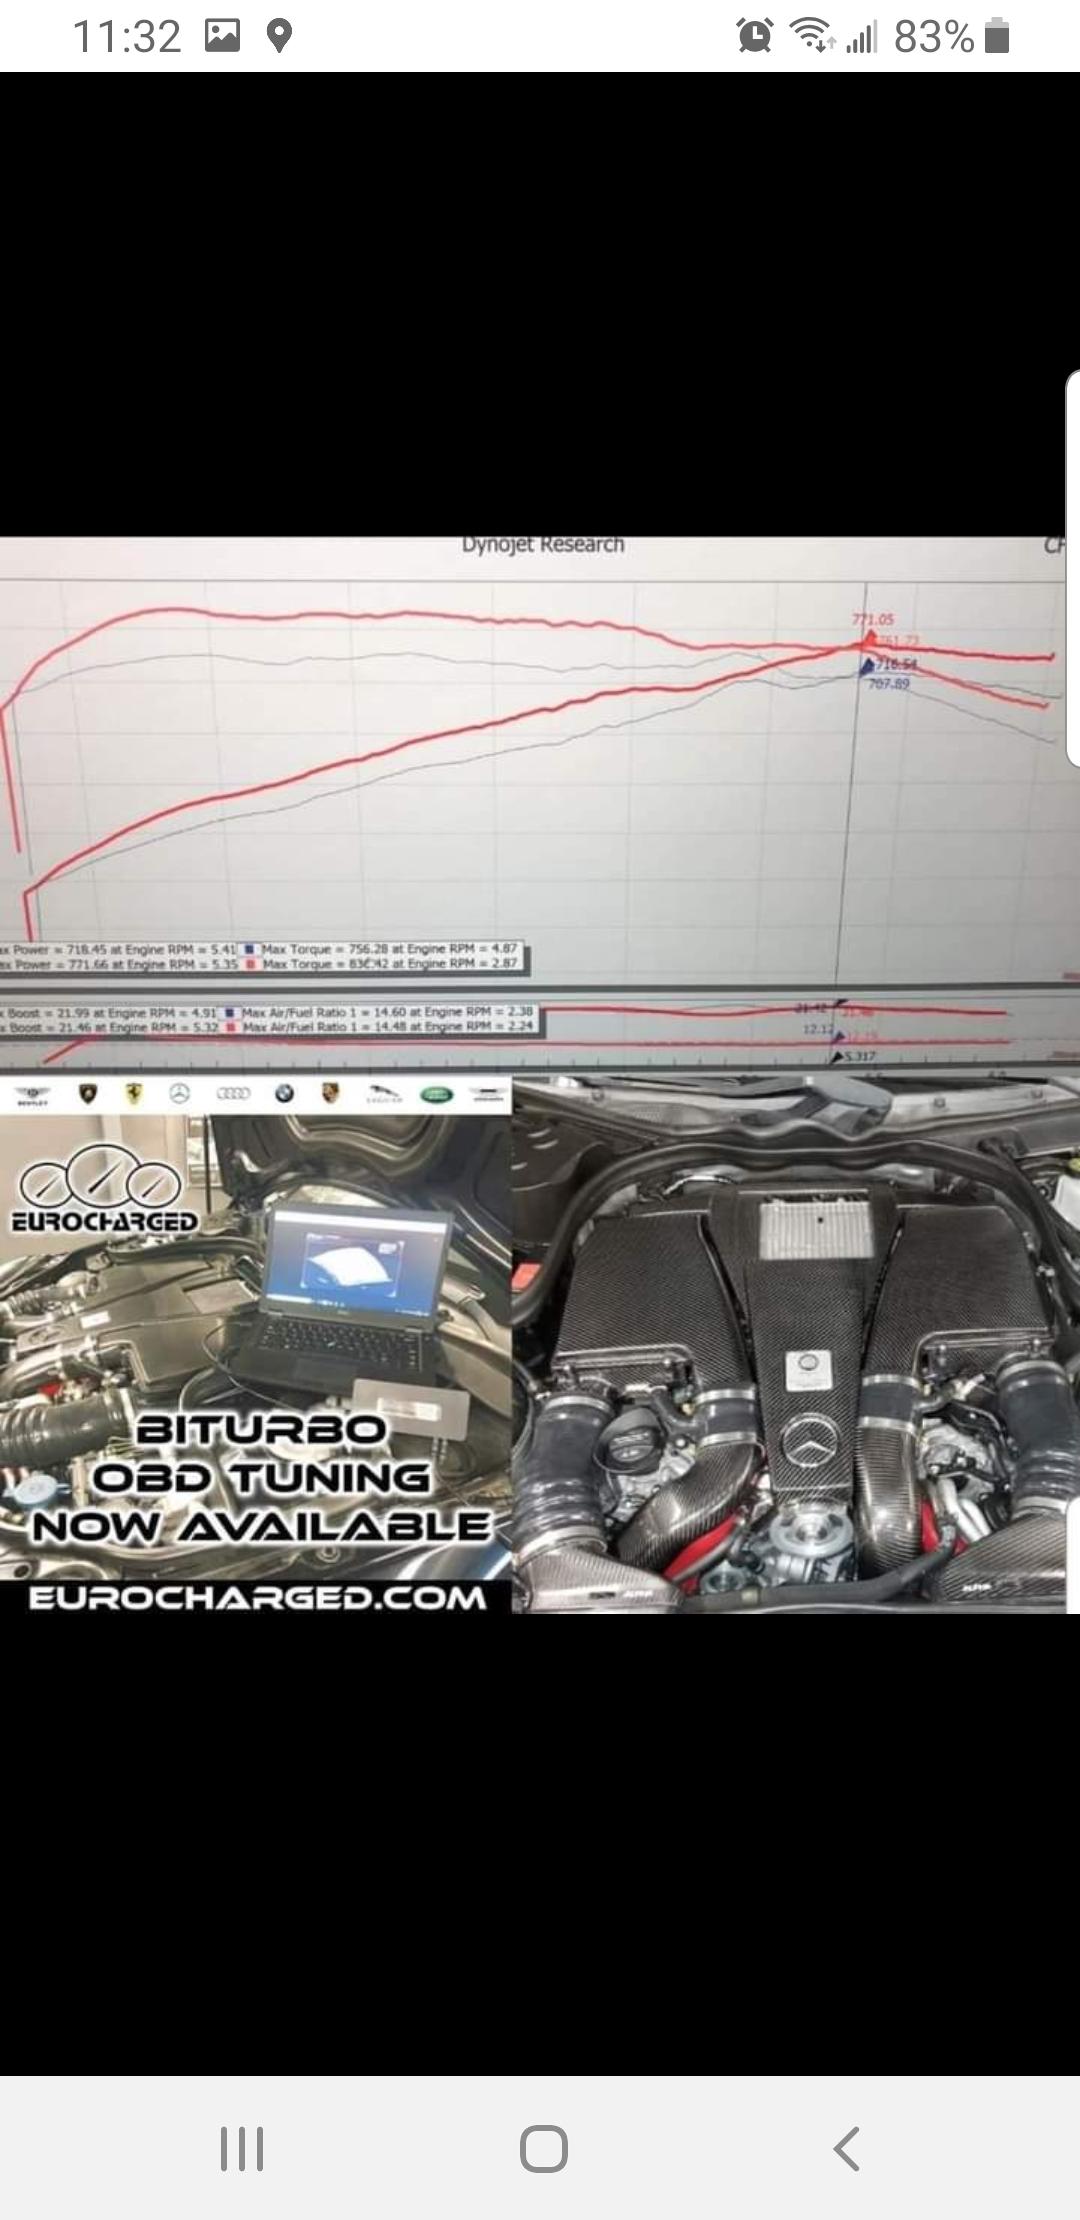 Mercedes-Benz E63 AMG Dyno Graph Results